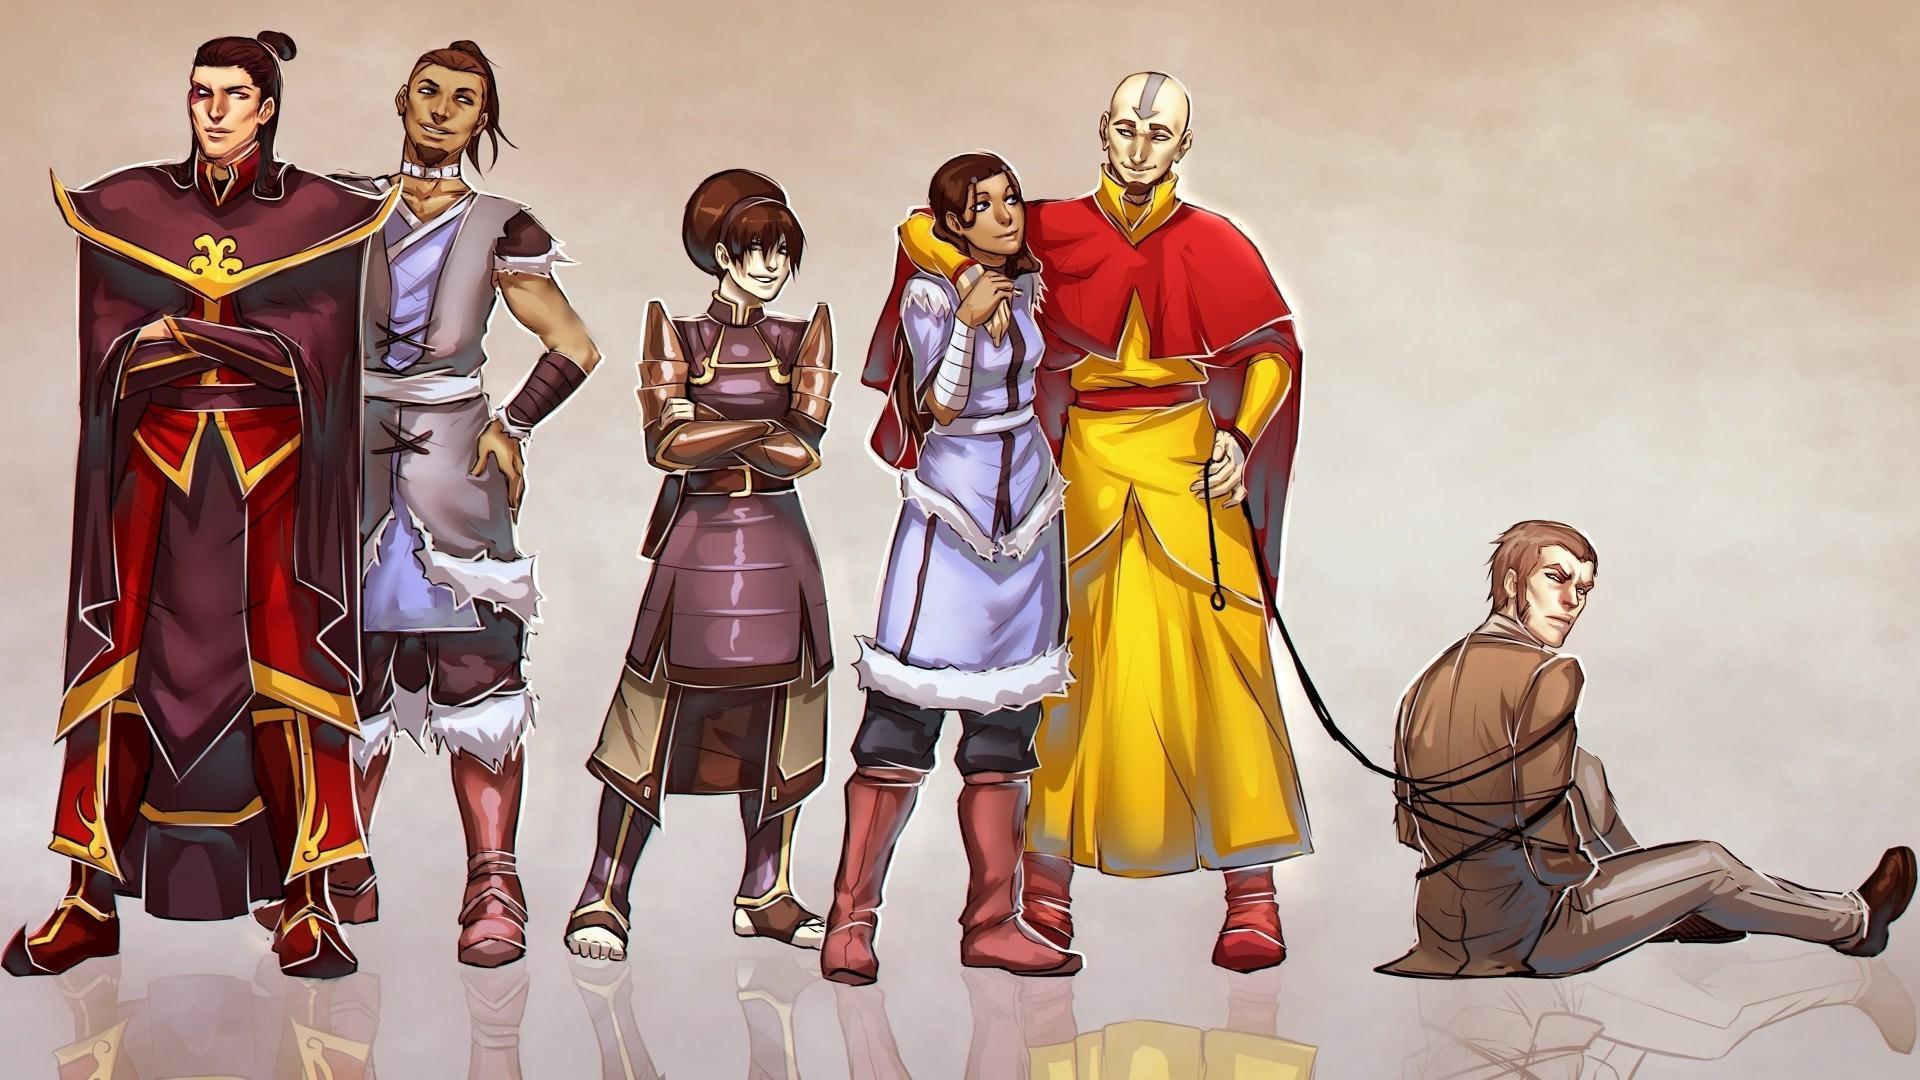 Avatar The Last Airbender Wallpaper 15271 - Avatar The ...